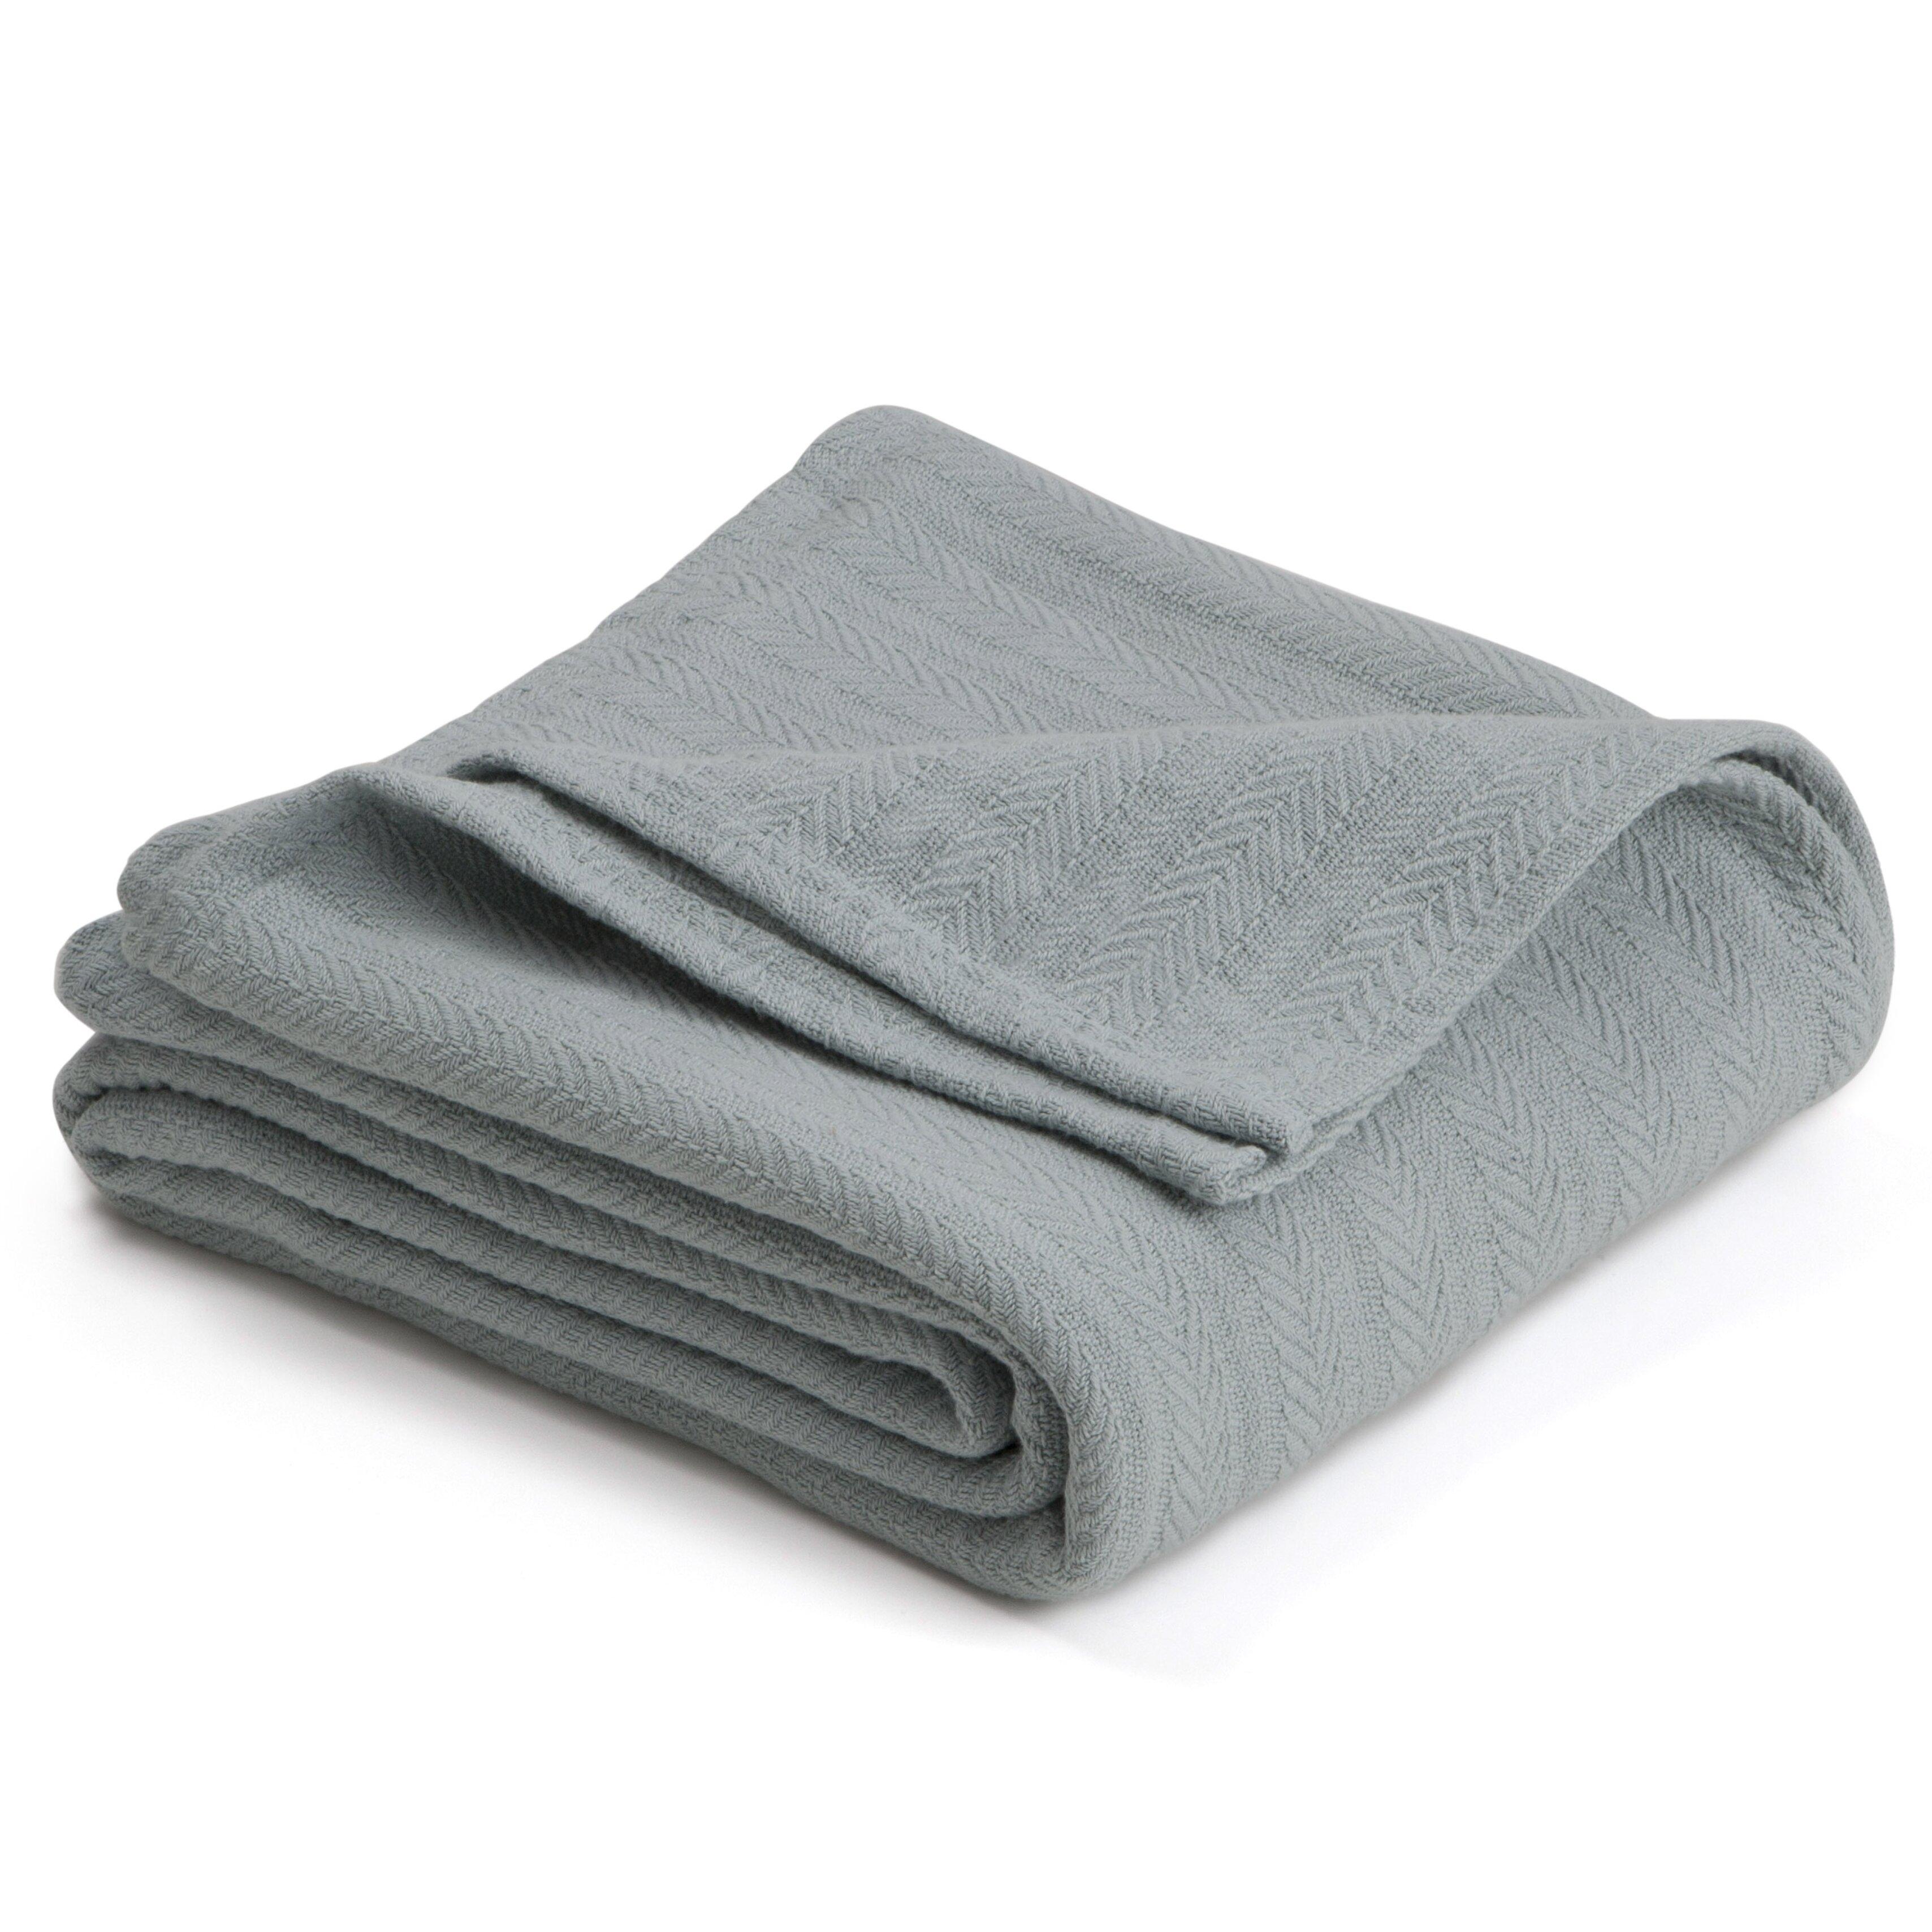 Vellux vellux woven cotton blanket reviews wayfair for Vellux blanket